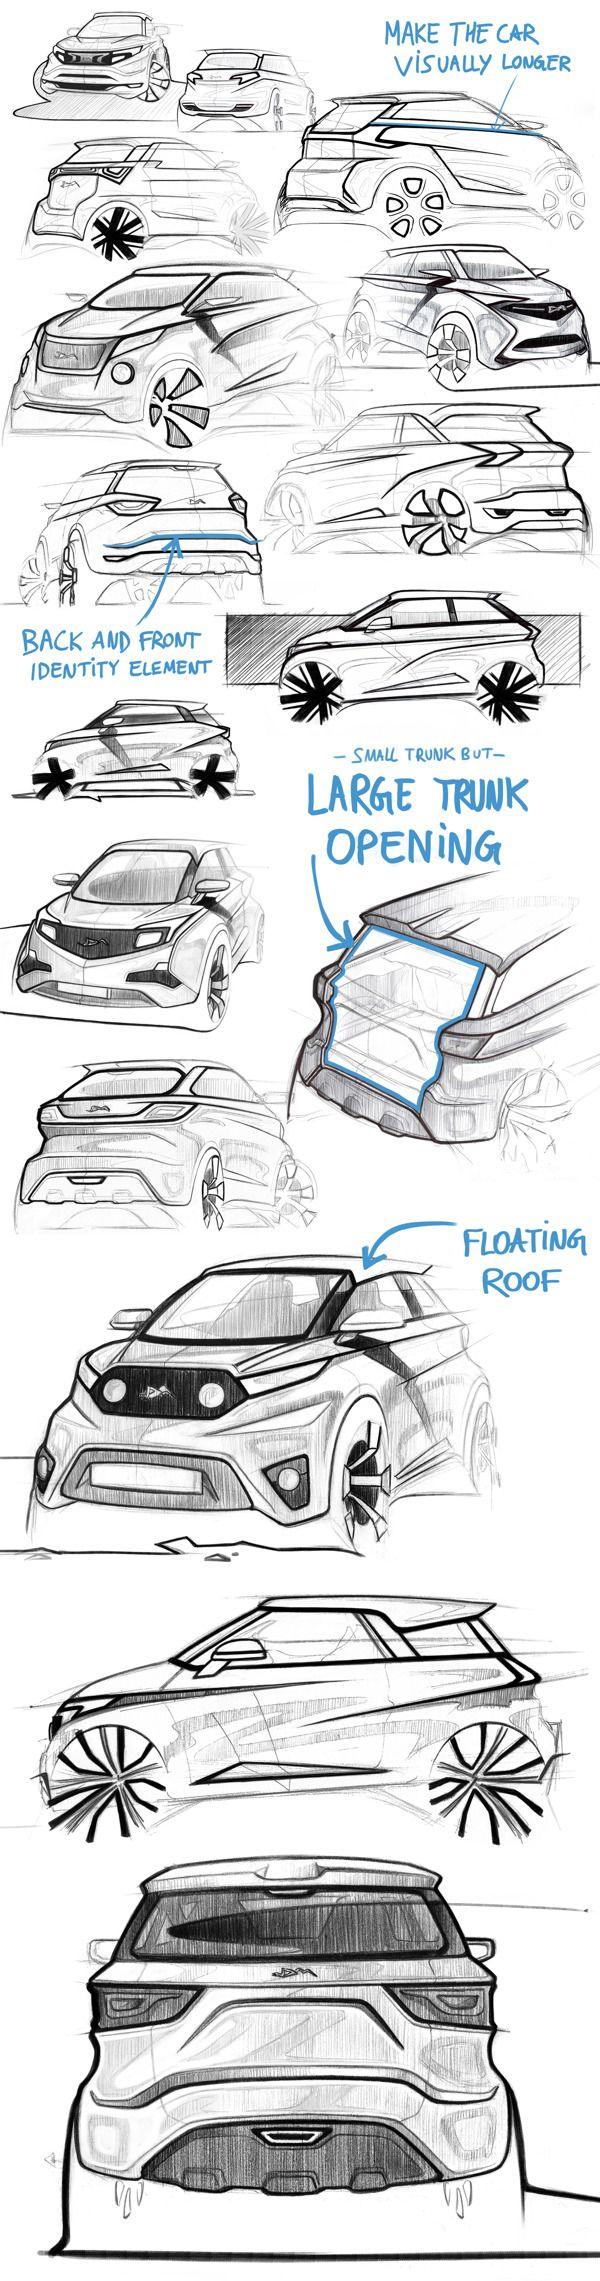 313 best car sketch images on Pinterest   Automotive design, Car ...